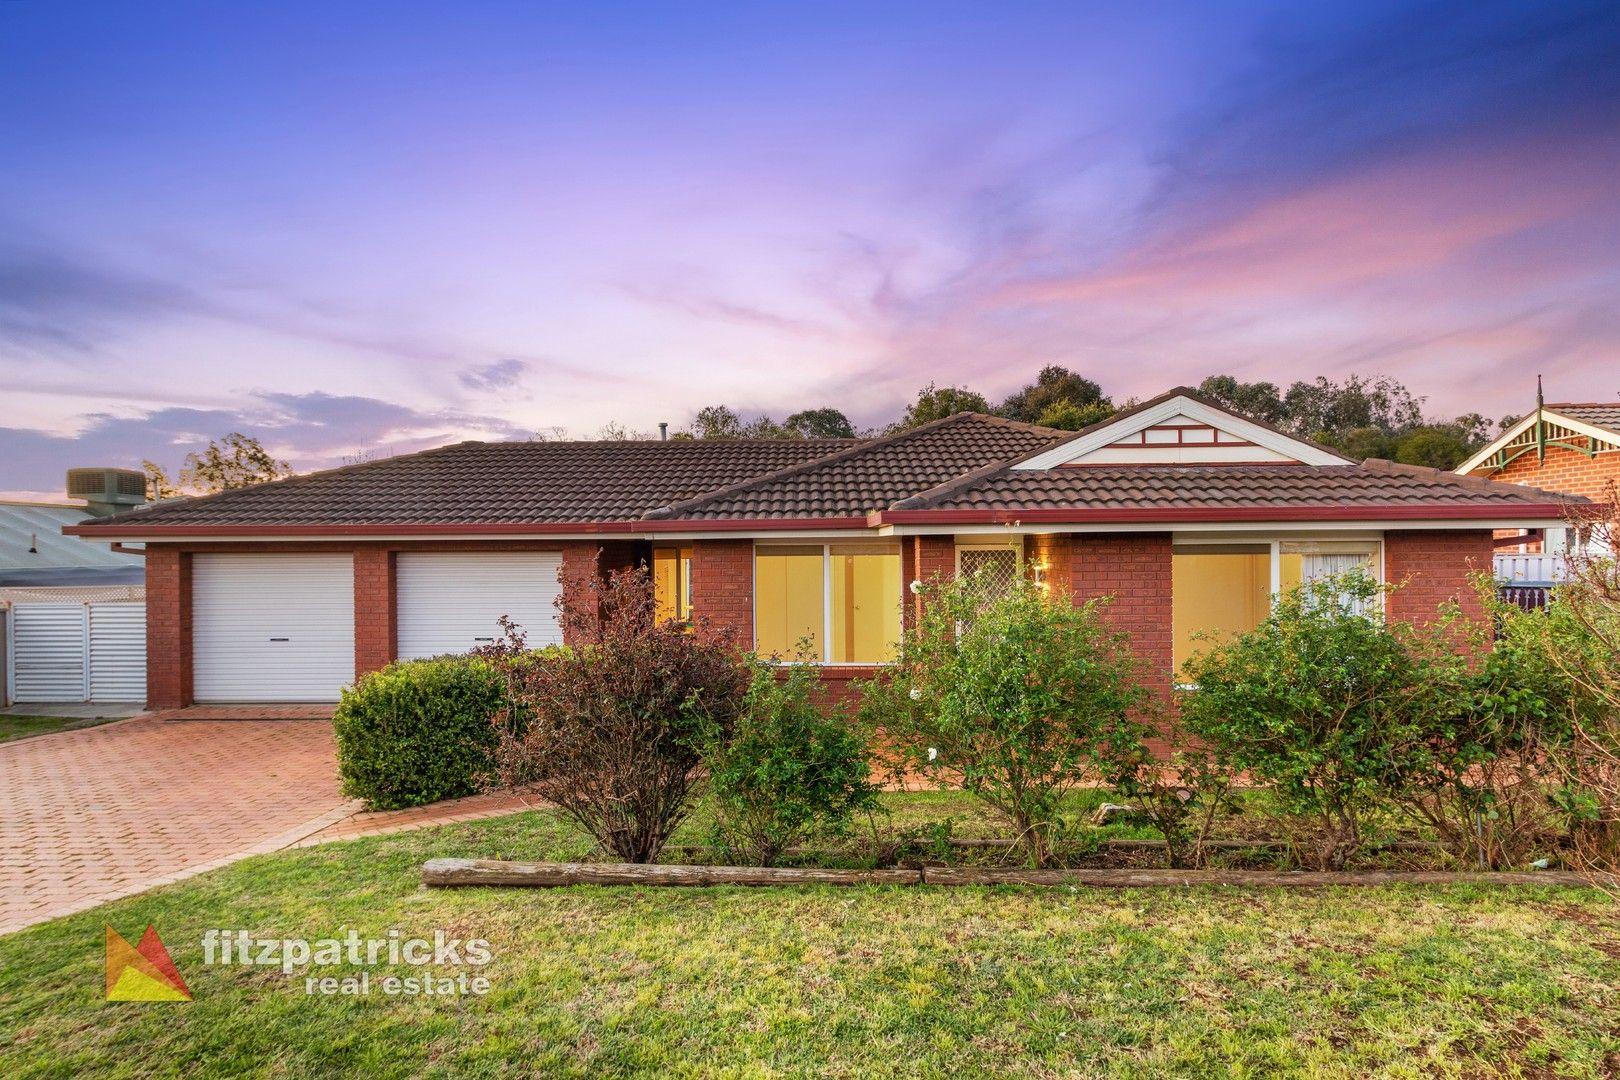 17 Bourkelands Drive, Bourkelands NSW 2650, Image 0